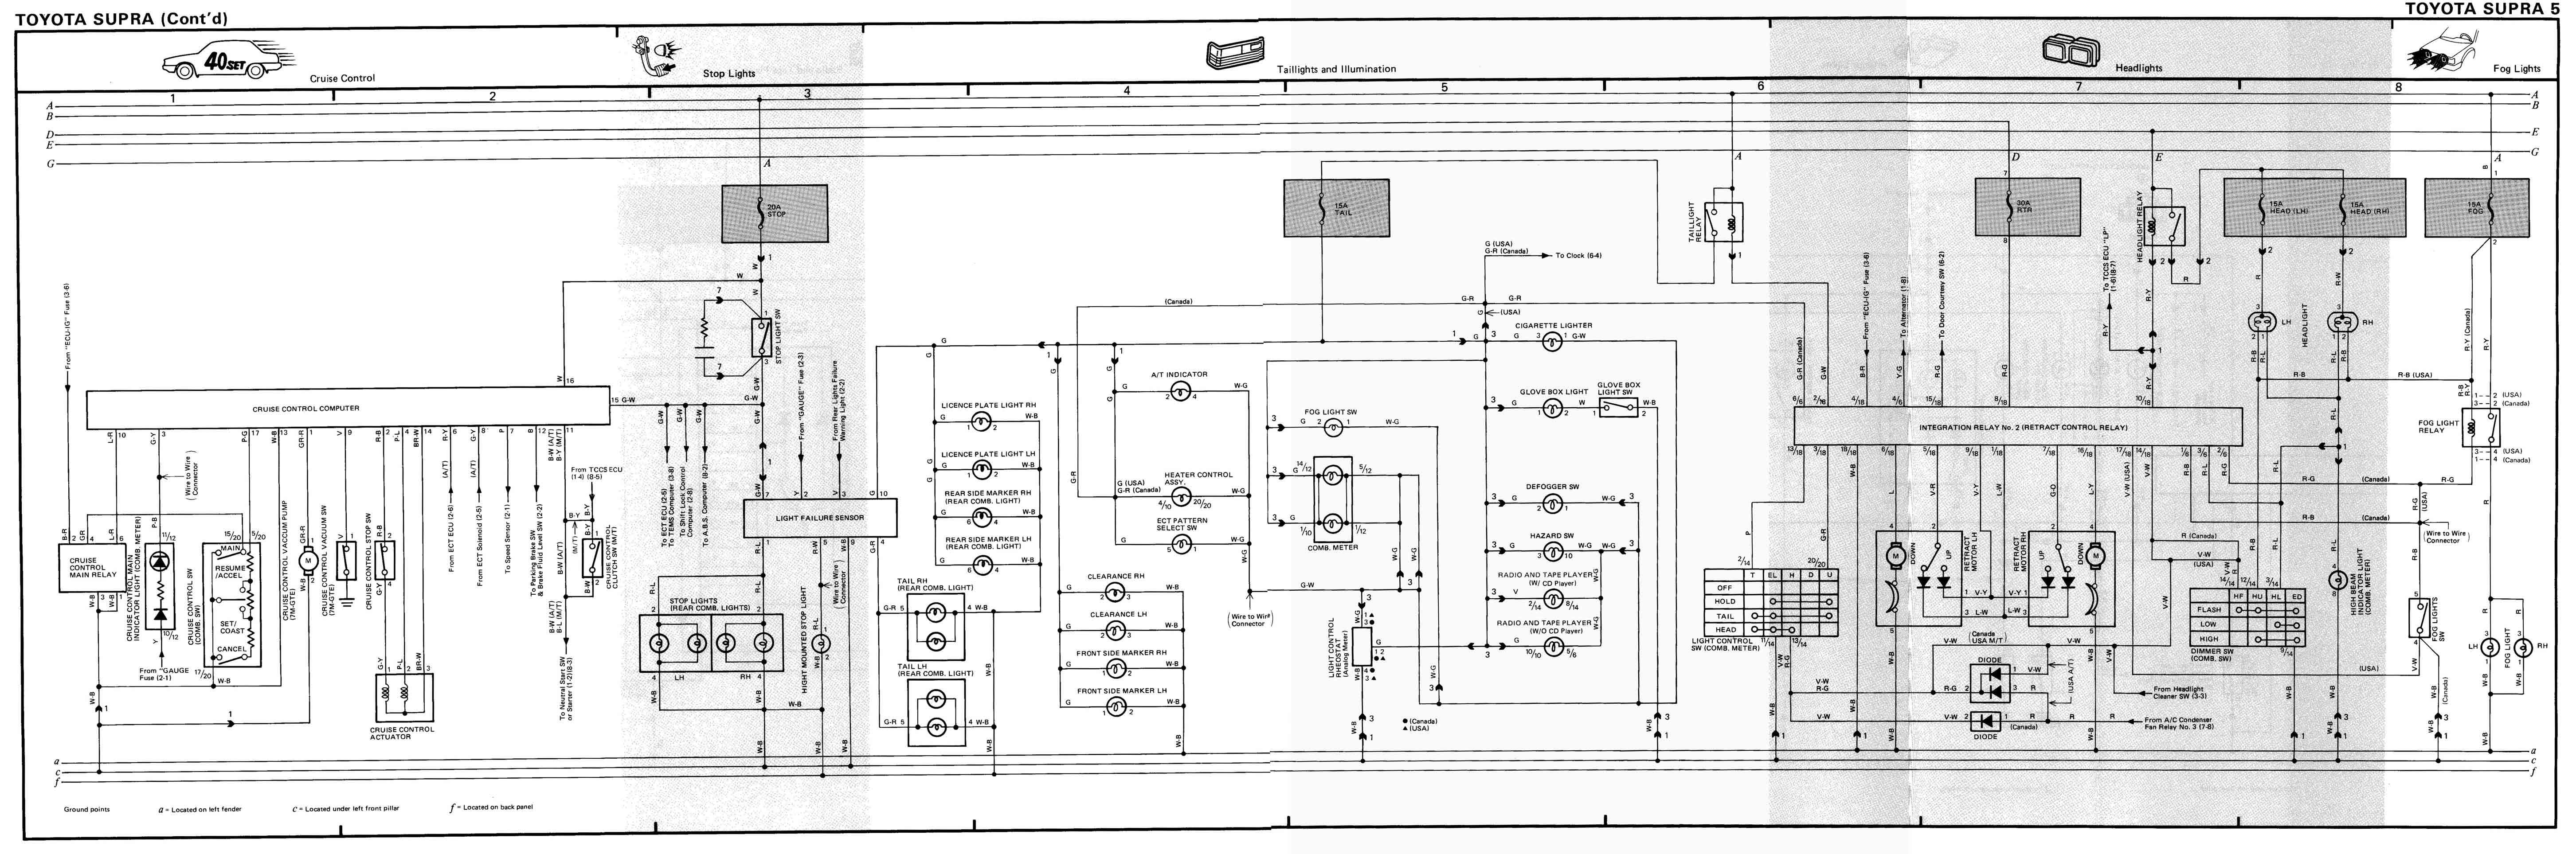 mk3 supra wiring diagram - fusebox and wiring diagram visualdraw-net -  visualdraw-net.sirtarghe.it  diagram database